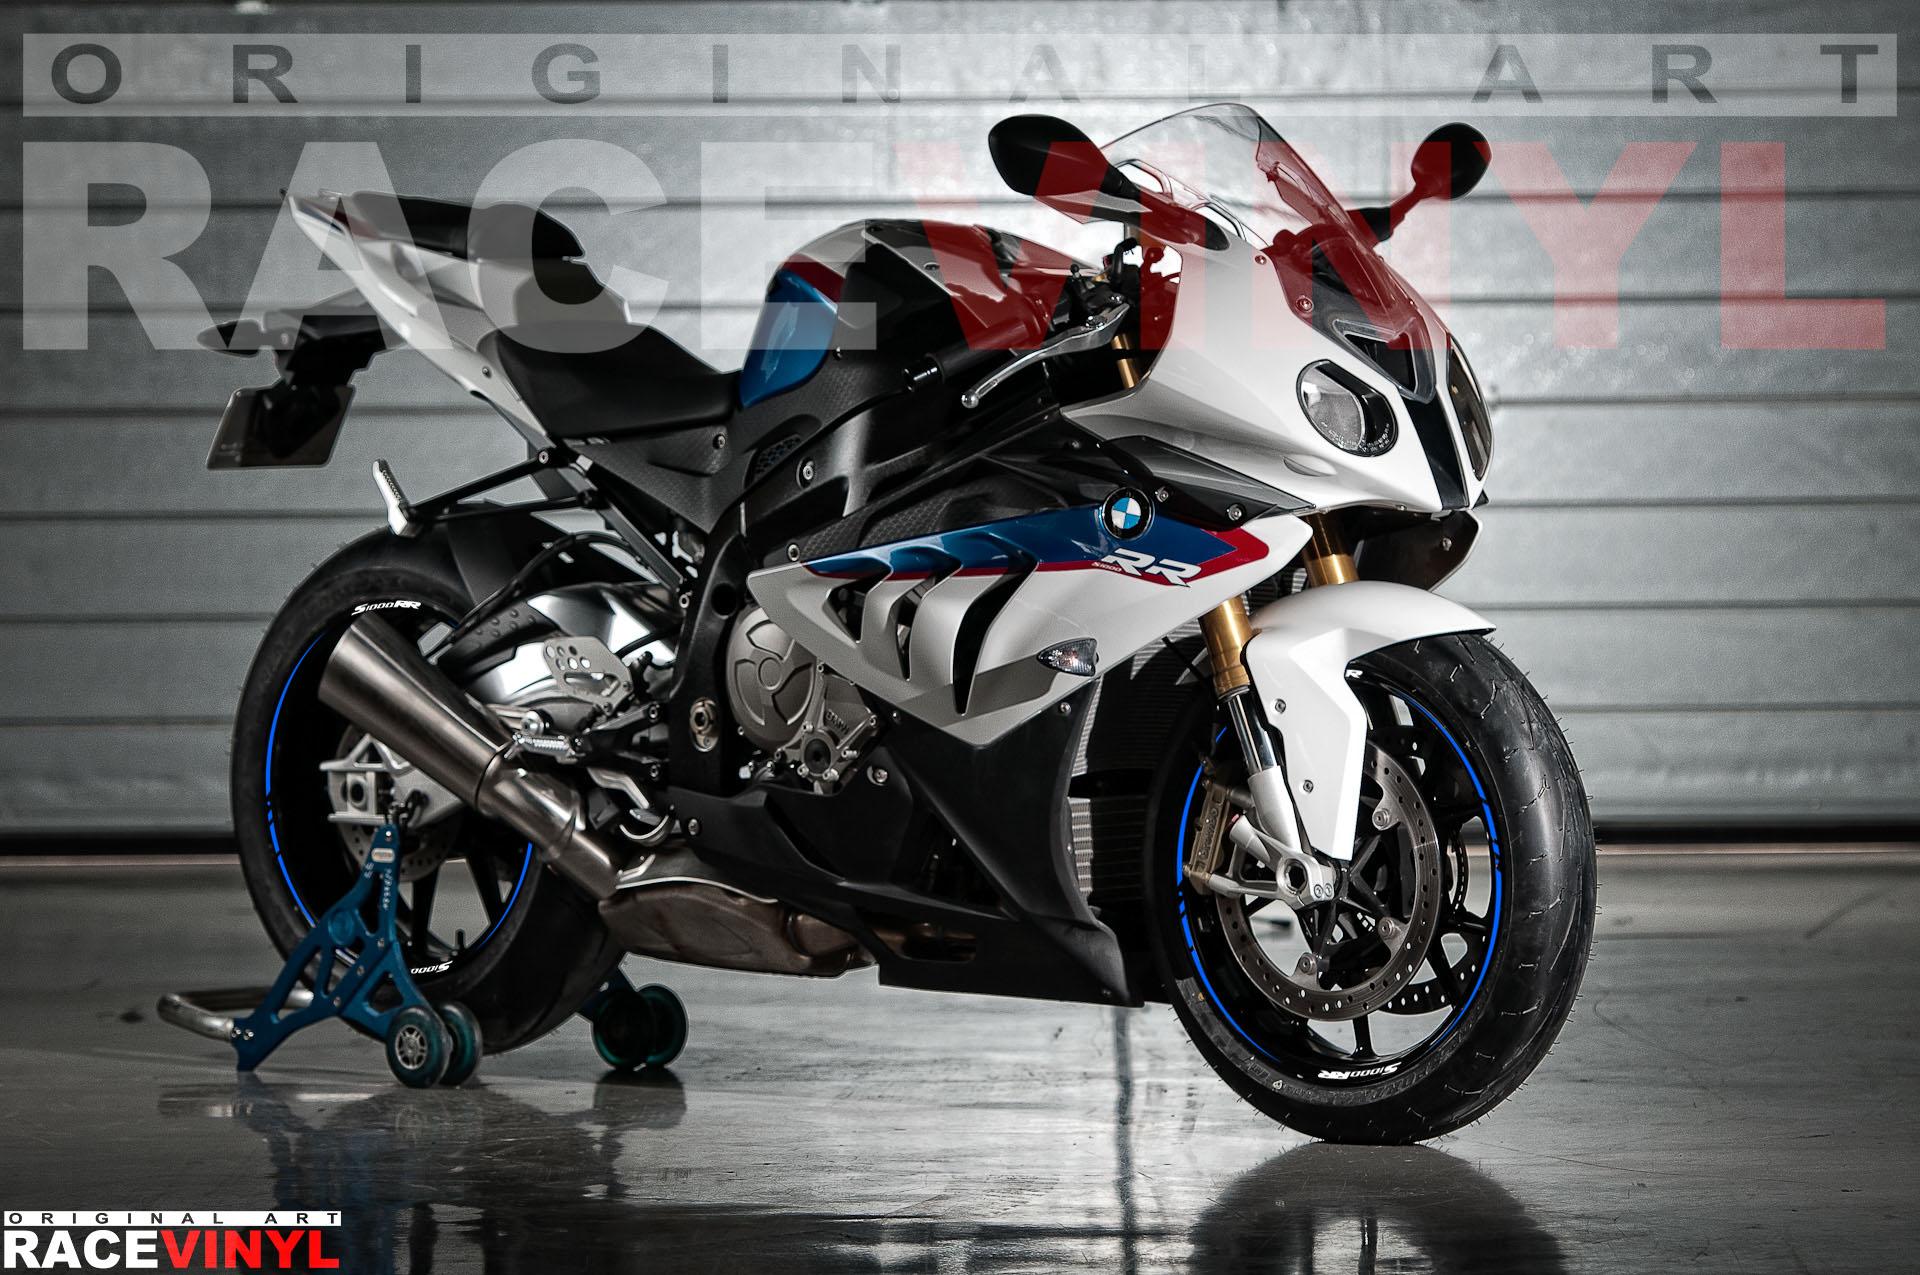 Racevinyl-BMW-s1000rr-s-1000-rr-hp2-hp4-wallpaper-3-Custom-Tuning-Pegatina-llanta-moto-adhesivo-vinilo-sticker-stripe-rim-wheel-vinyl-race-logo.jpg